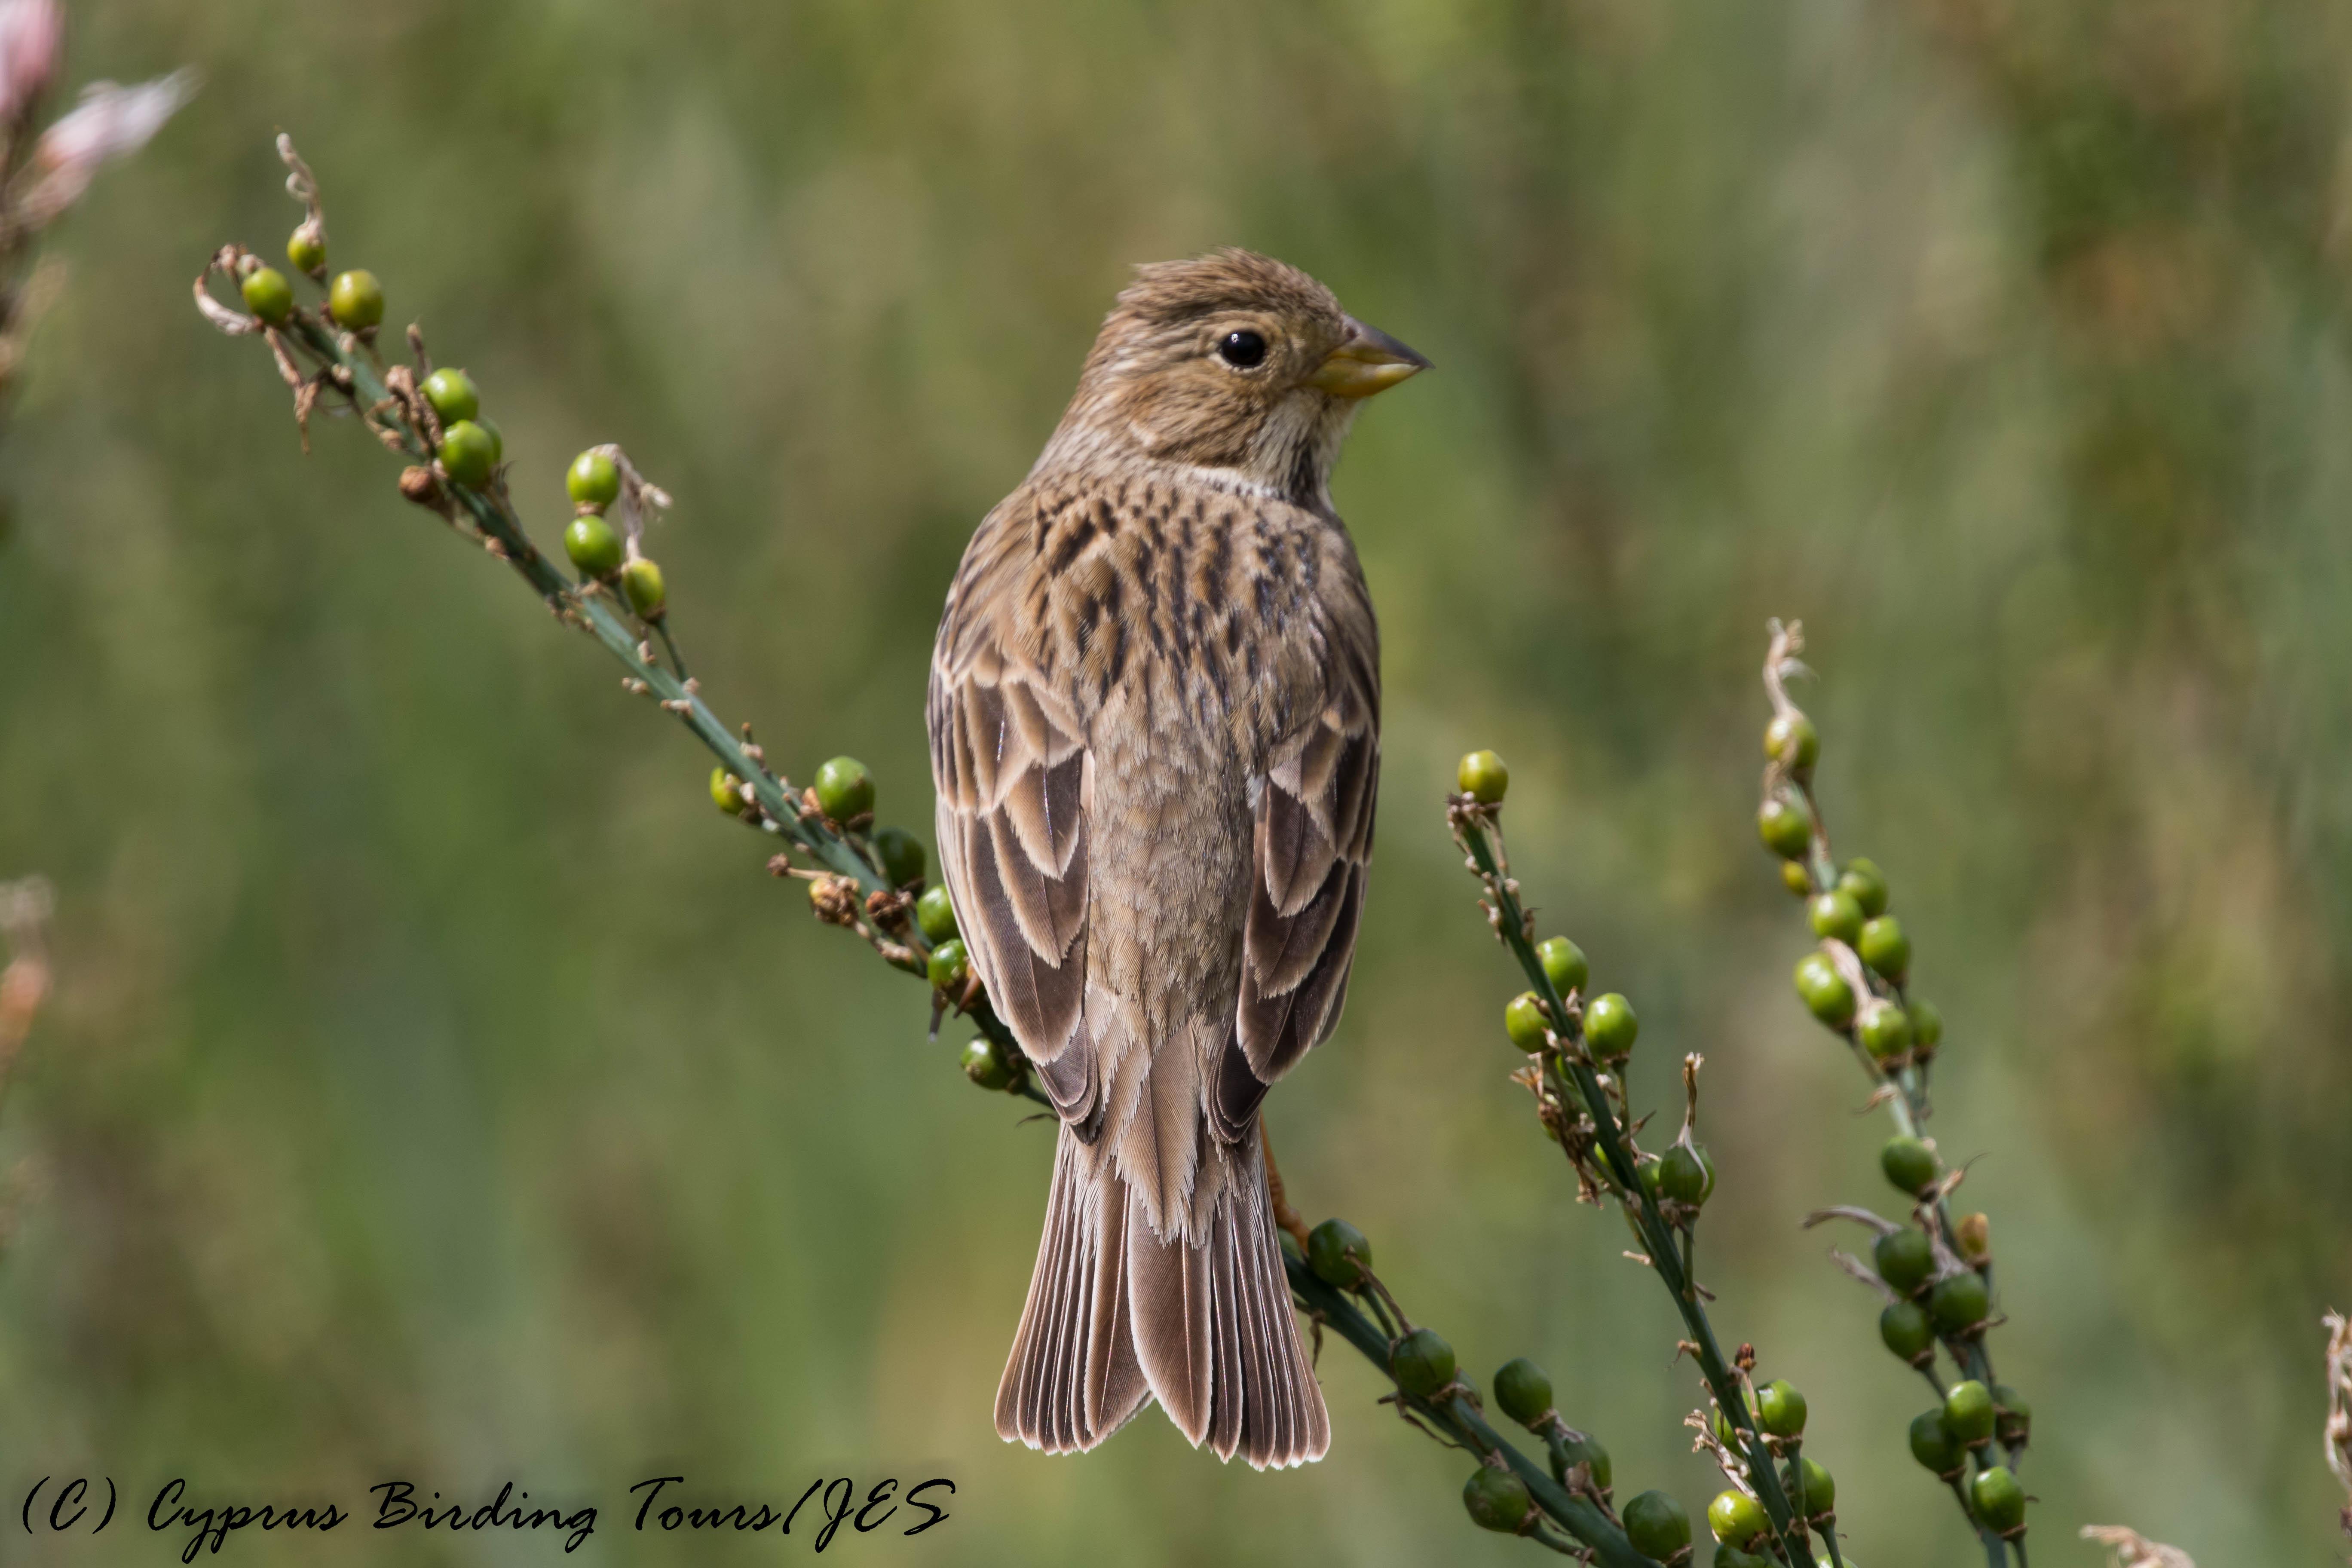 Corn Bunting, Anarita Park, 1st April 2017 (c) Cyprus Birding Tours